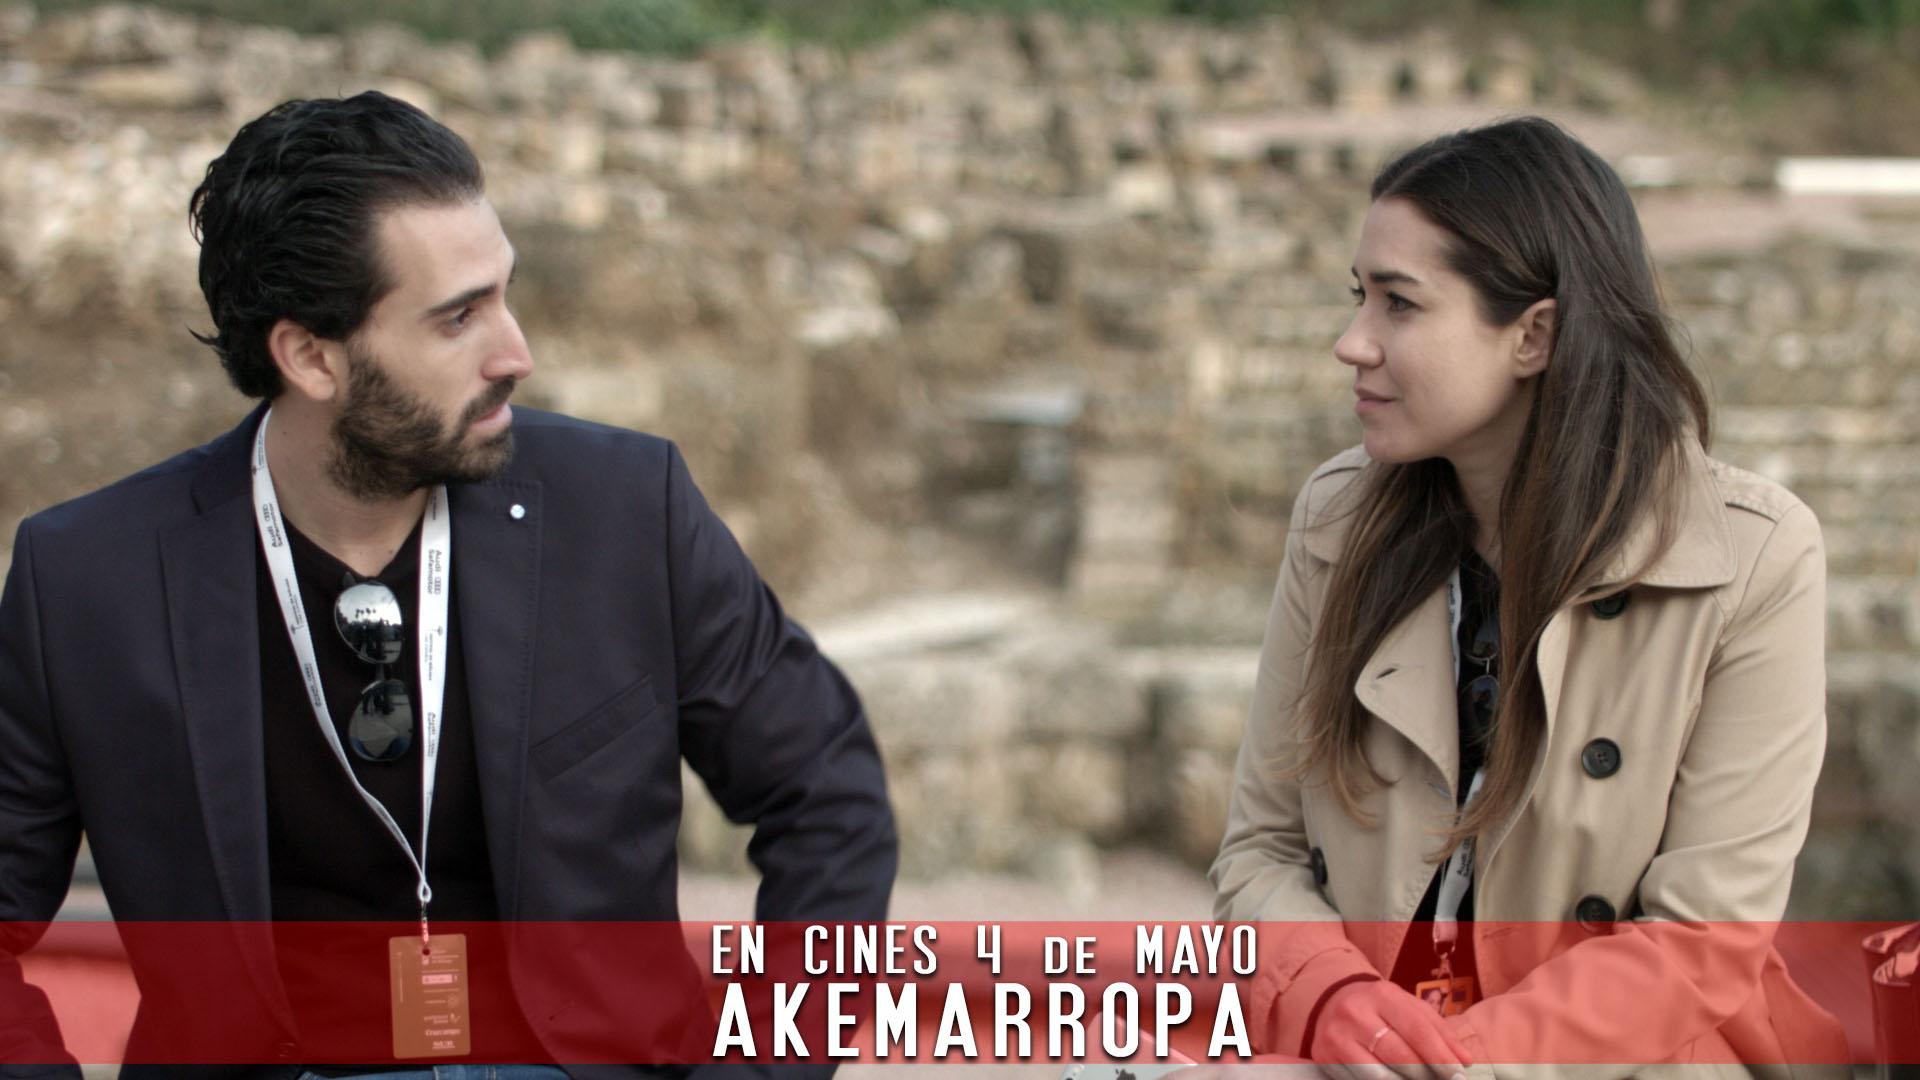 Pelicula Akemarropa Jorge Porras y Elena Martinez